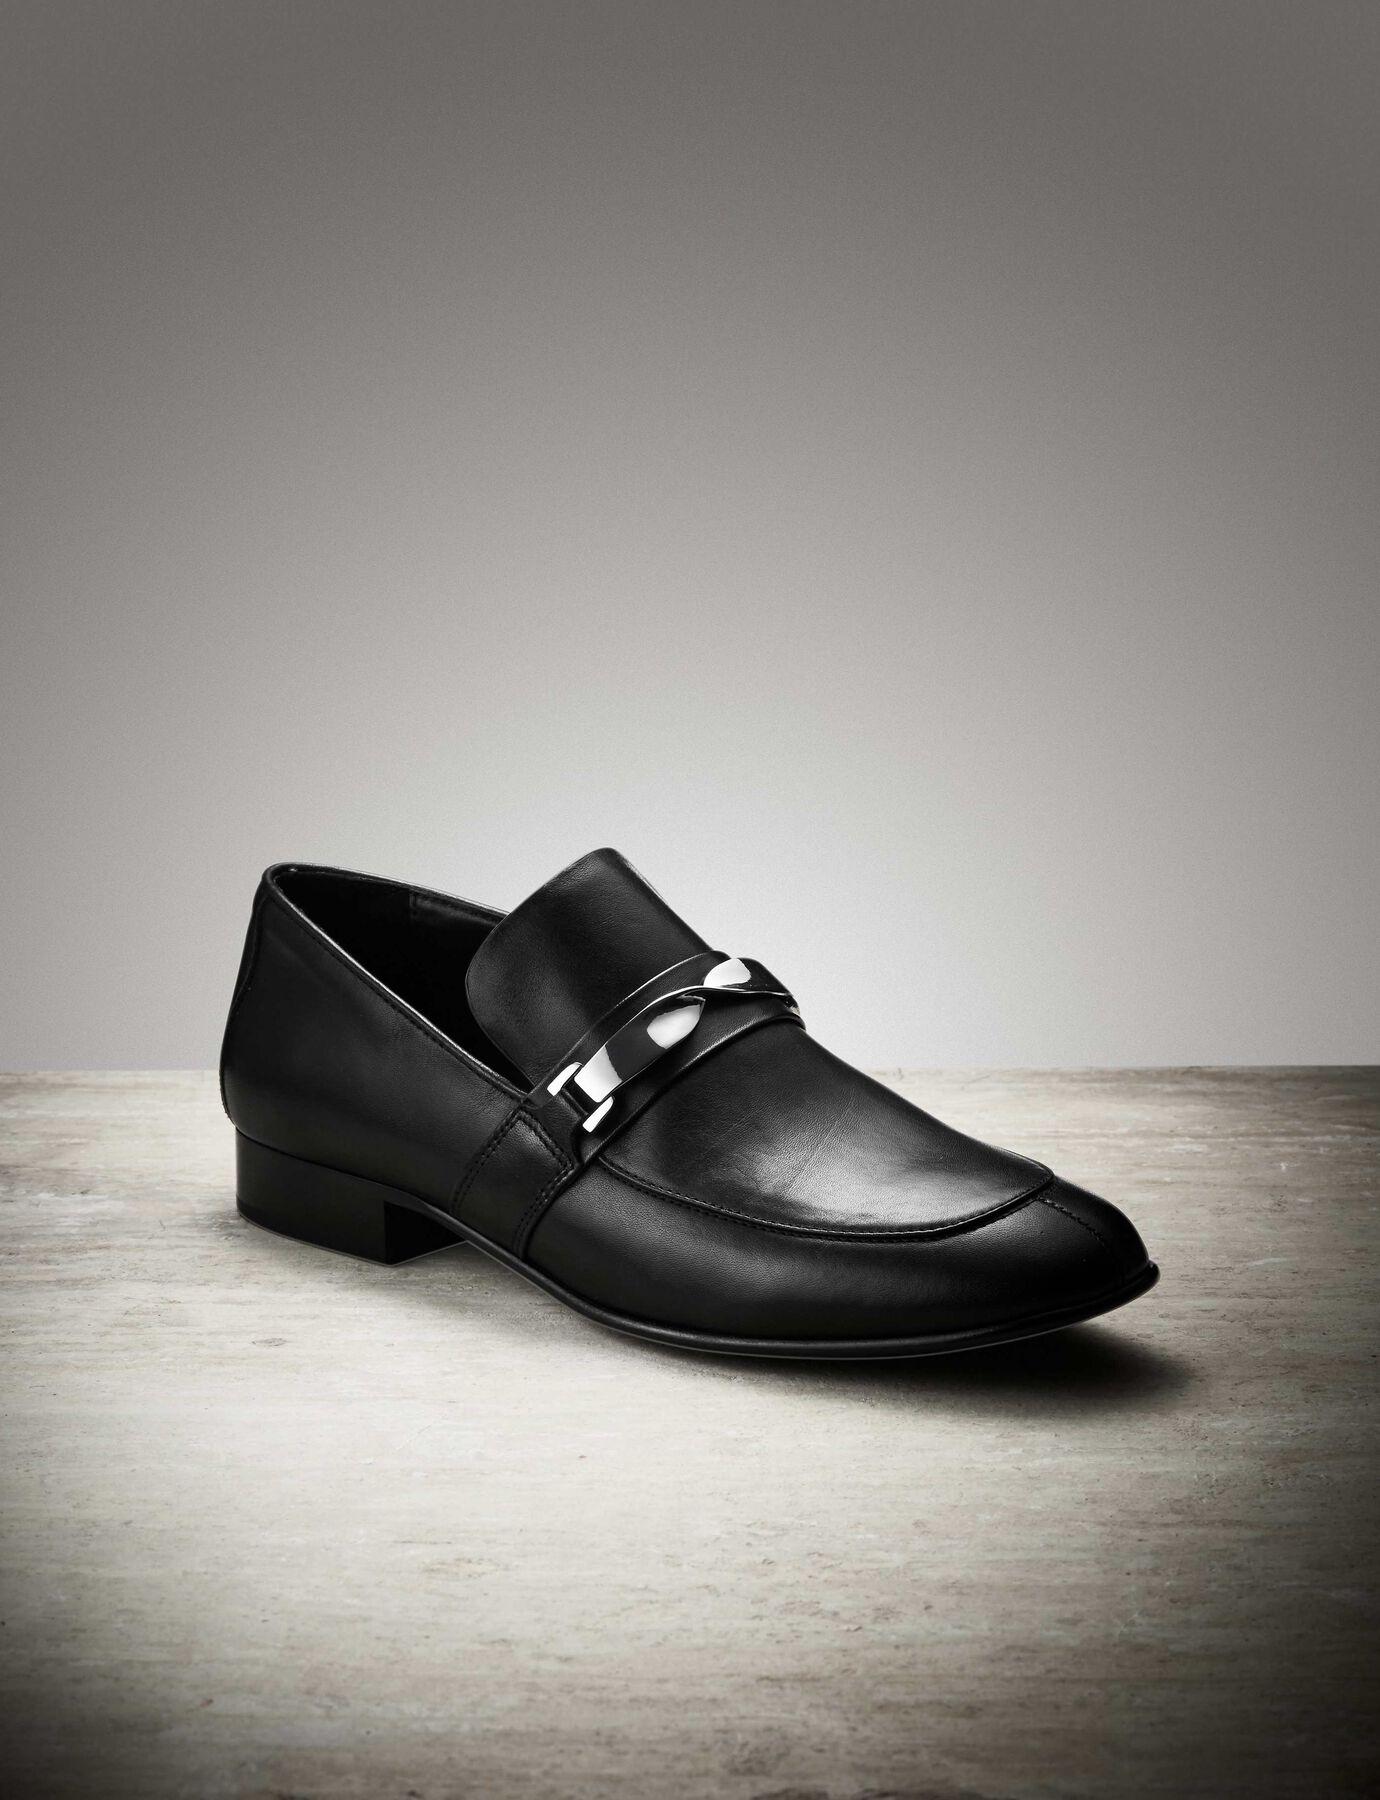 Earley Loafer in Black from Tiger of Sweden